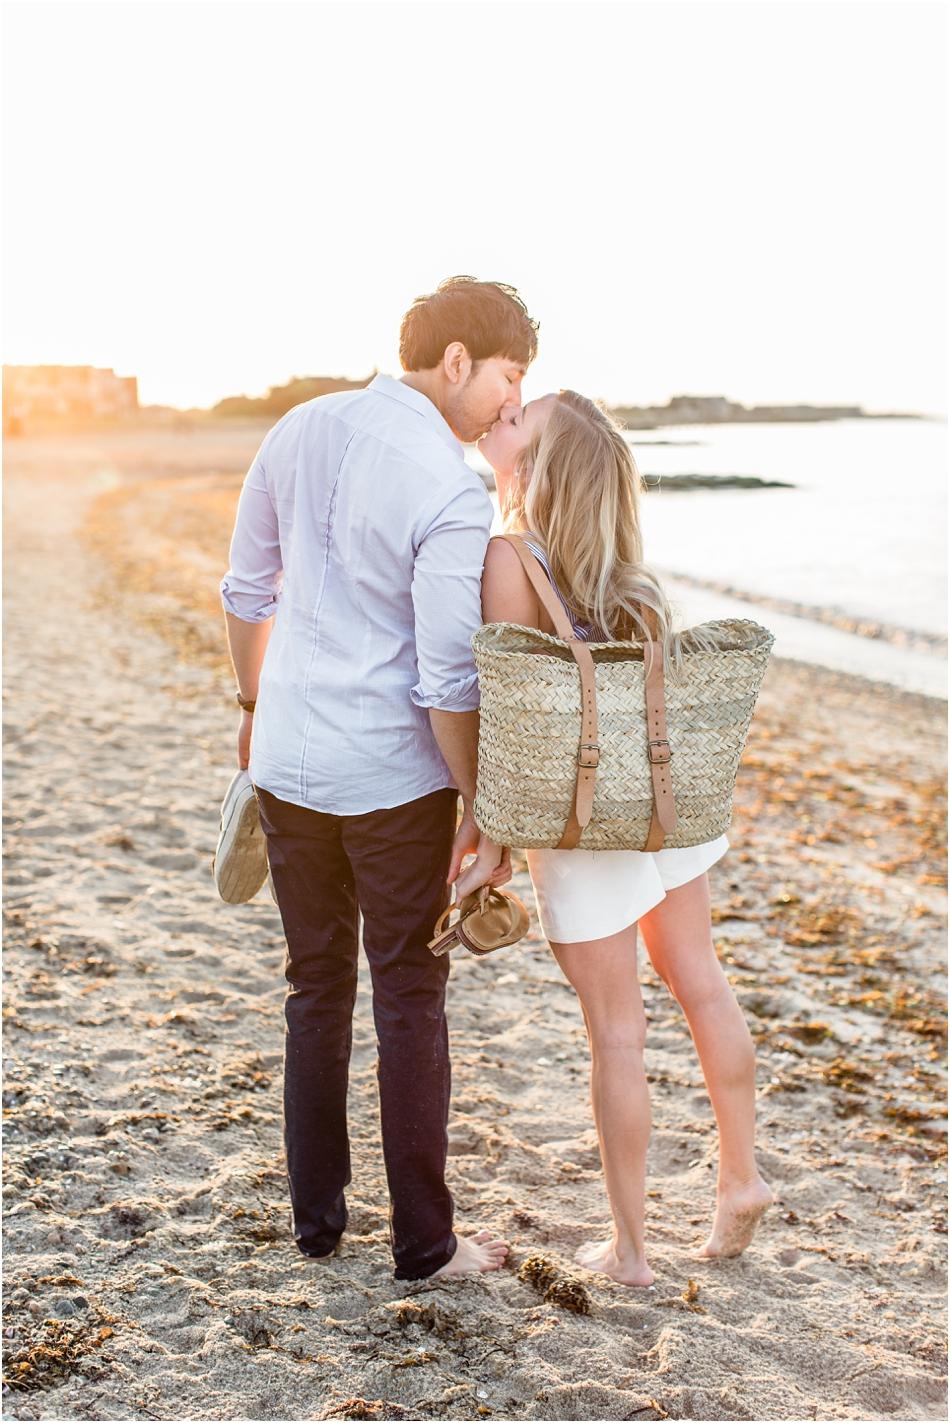 falmouth_beach_engagement_green_pond_boston_massachusetts_cape_cod_new_england_wedding_photographer_Meredith_Jane_Photography_photo_1637.jpg